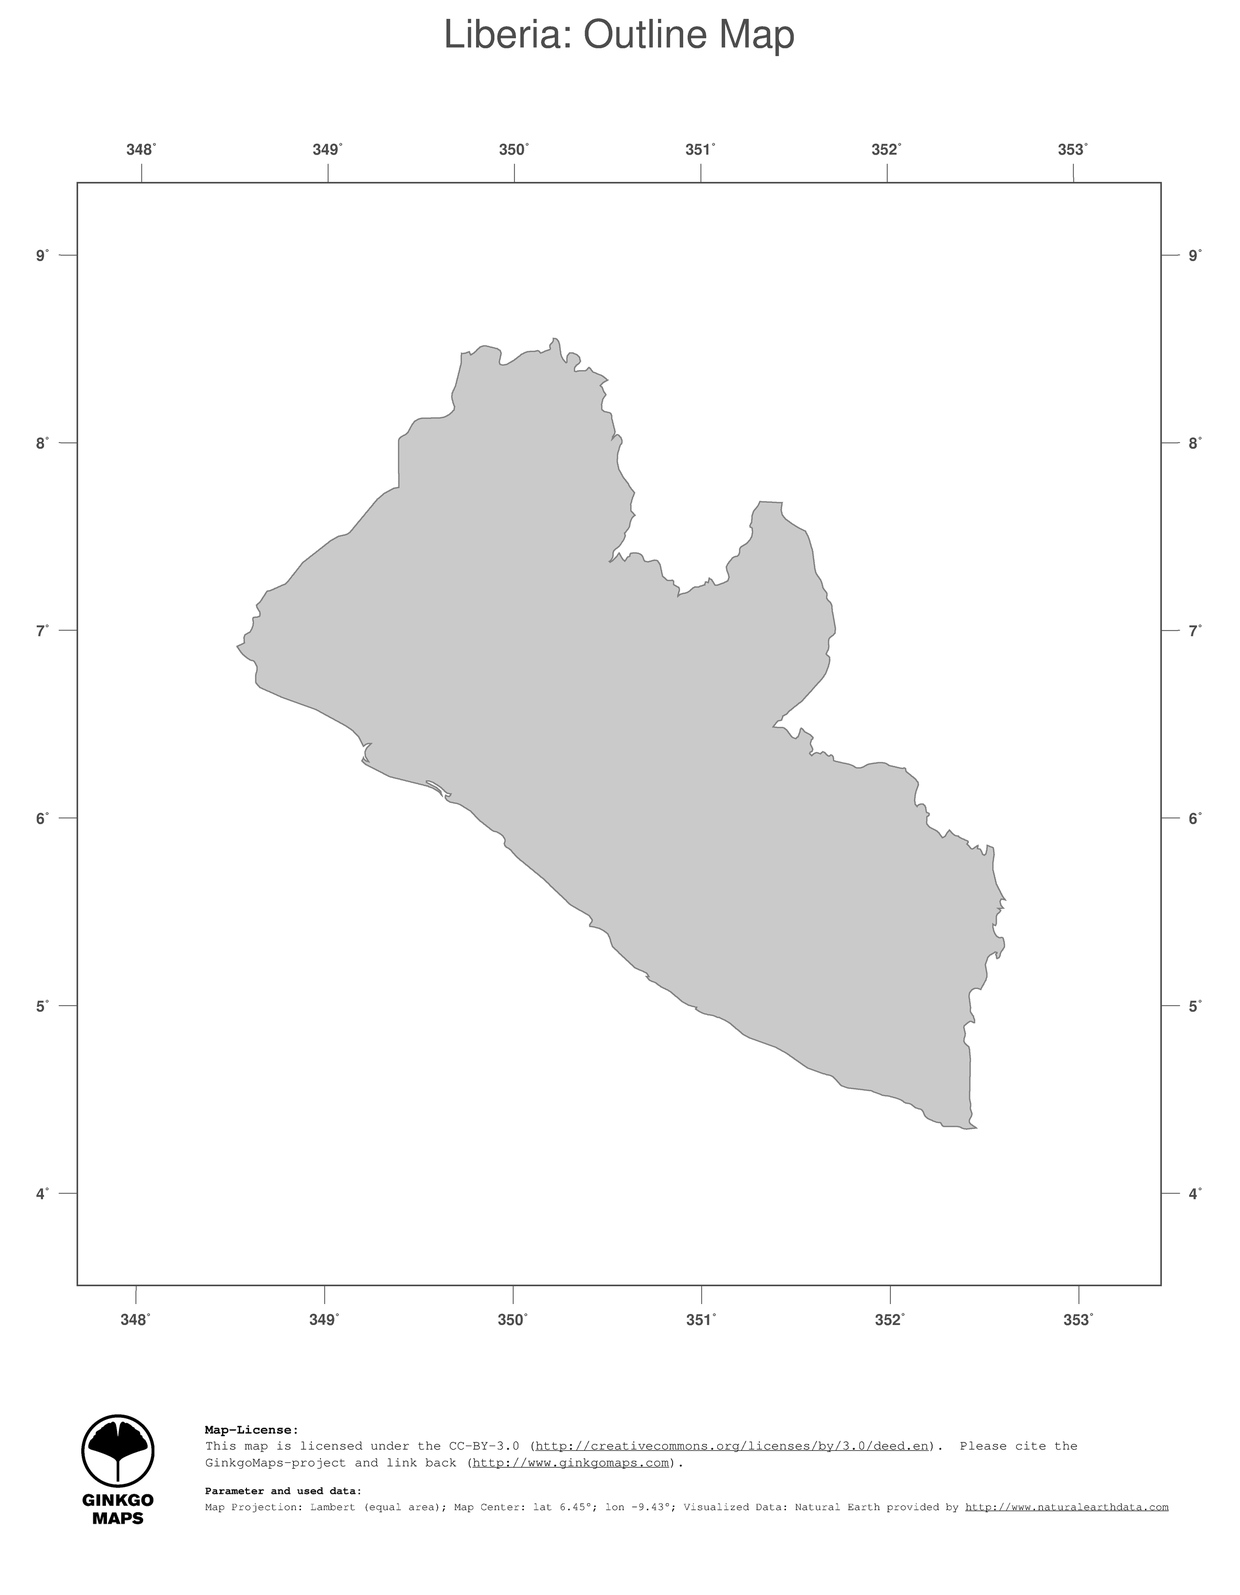 Map Liberia GinkgoMaps continent Africa region Liberia